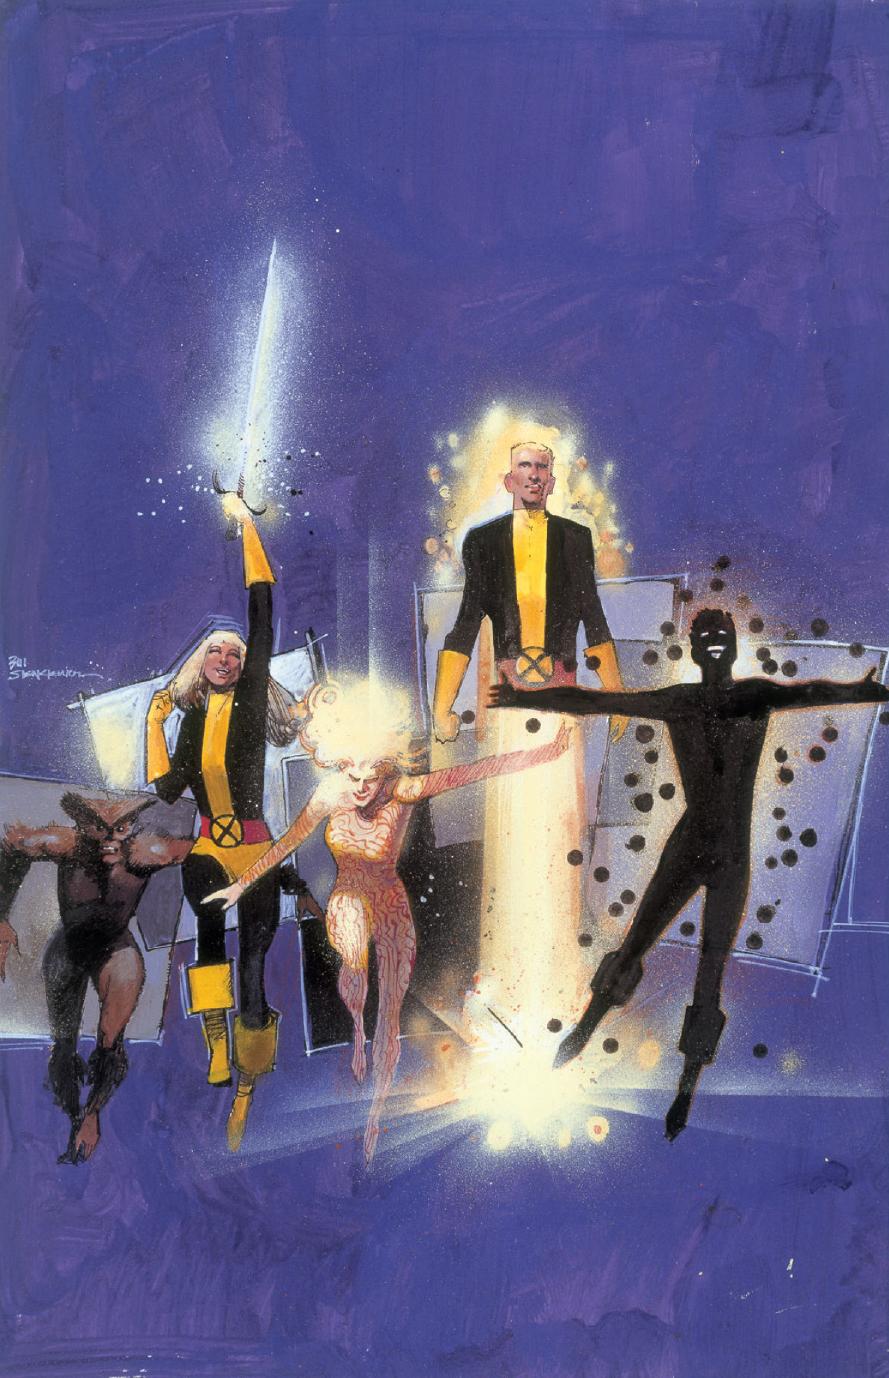 New Mutants (Earth-616)/Gallery